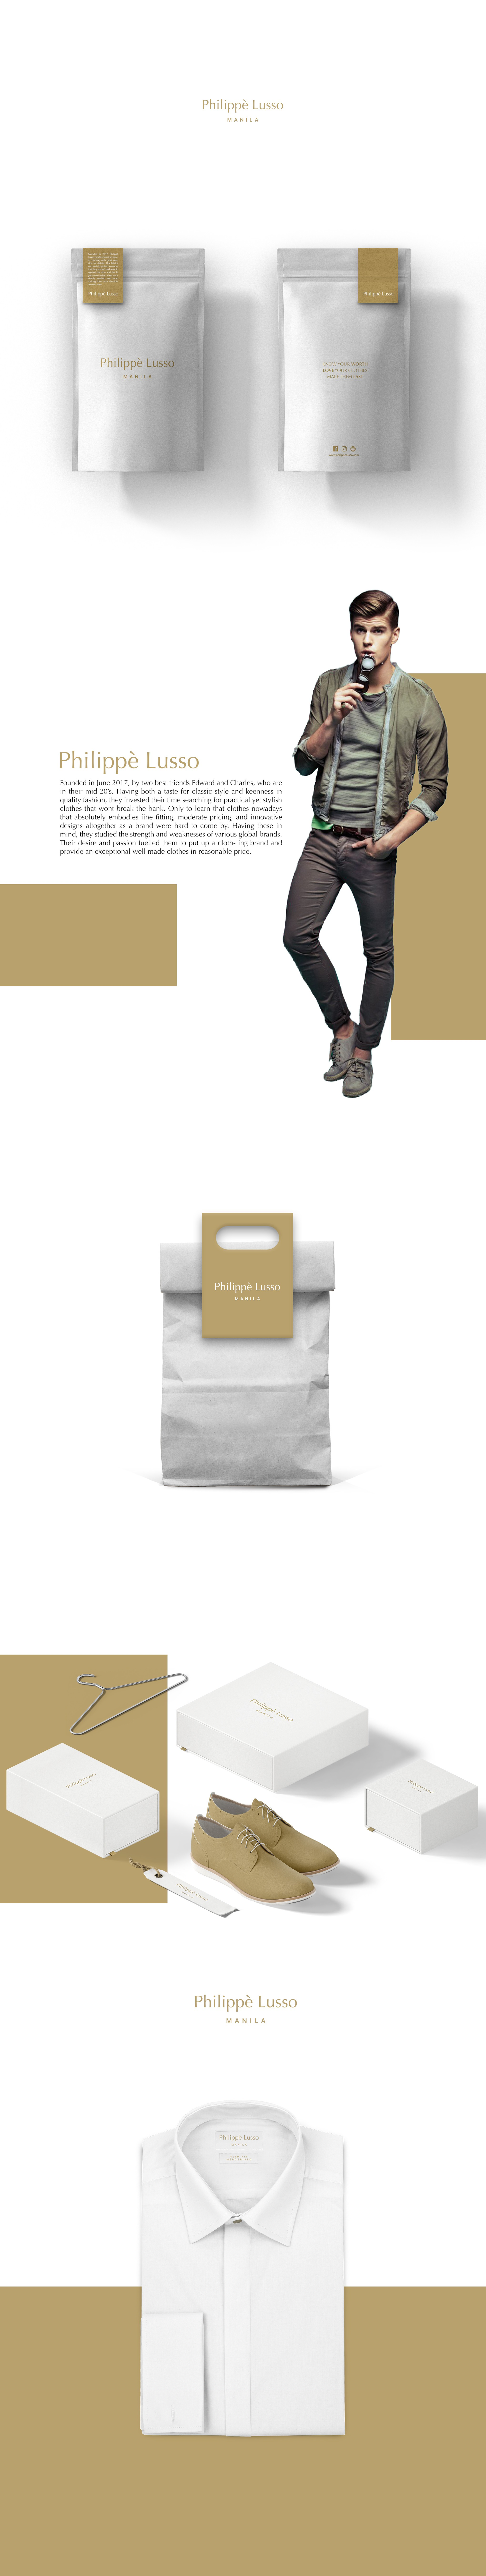 Philippè Lusso Retail Packaging